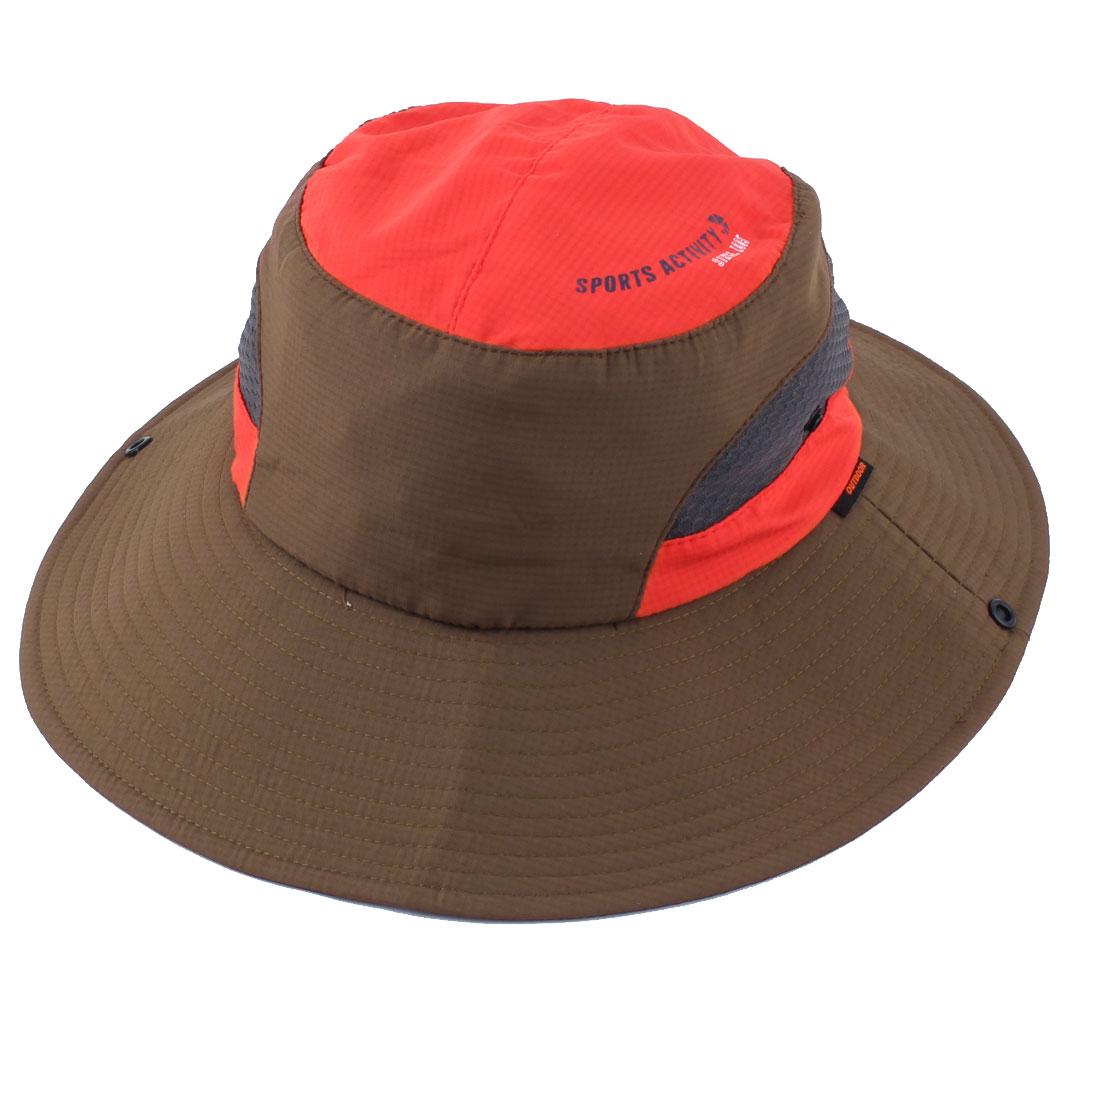 Fisherman Outdoor Fishing Travel Climbing Cycling Adjustable Folding Bucket Cap Floppy Hat Brown